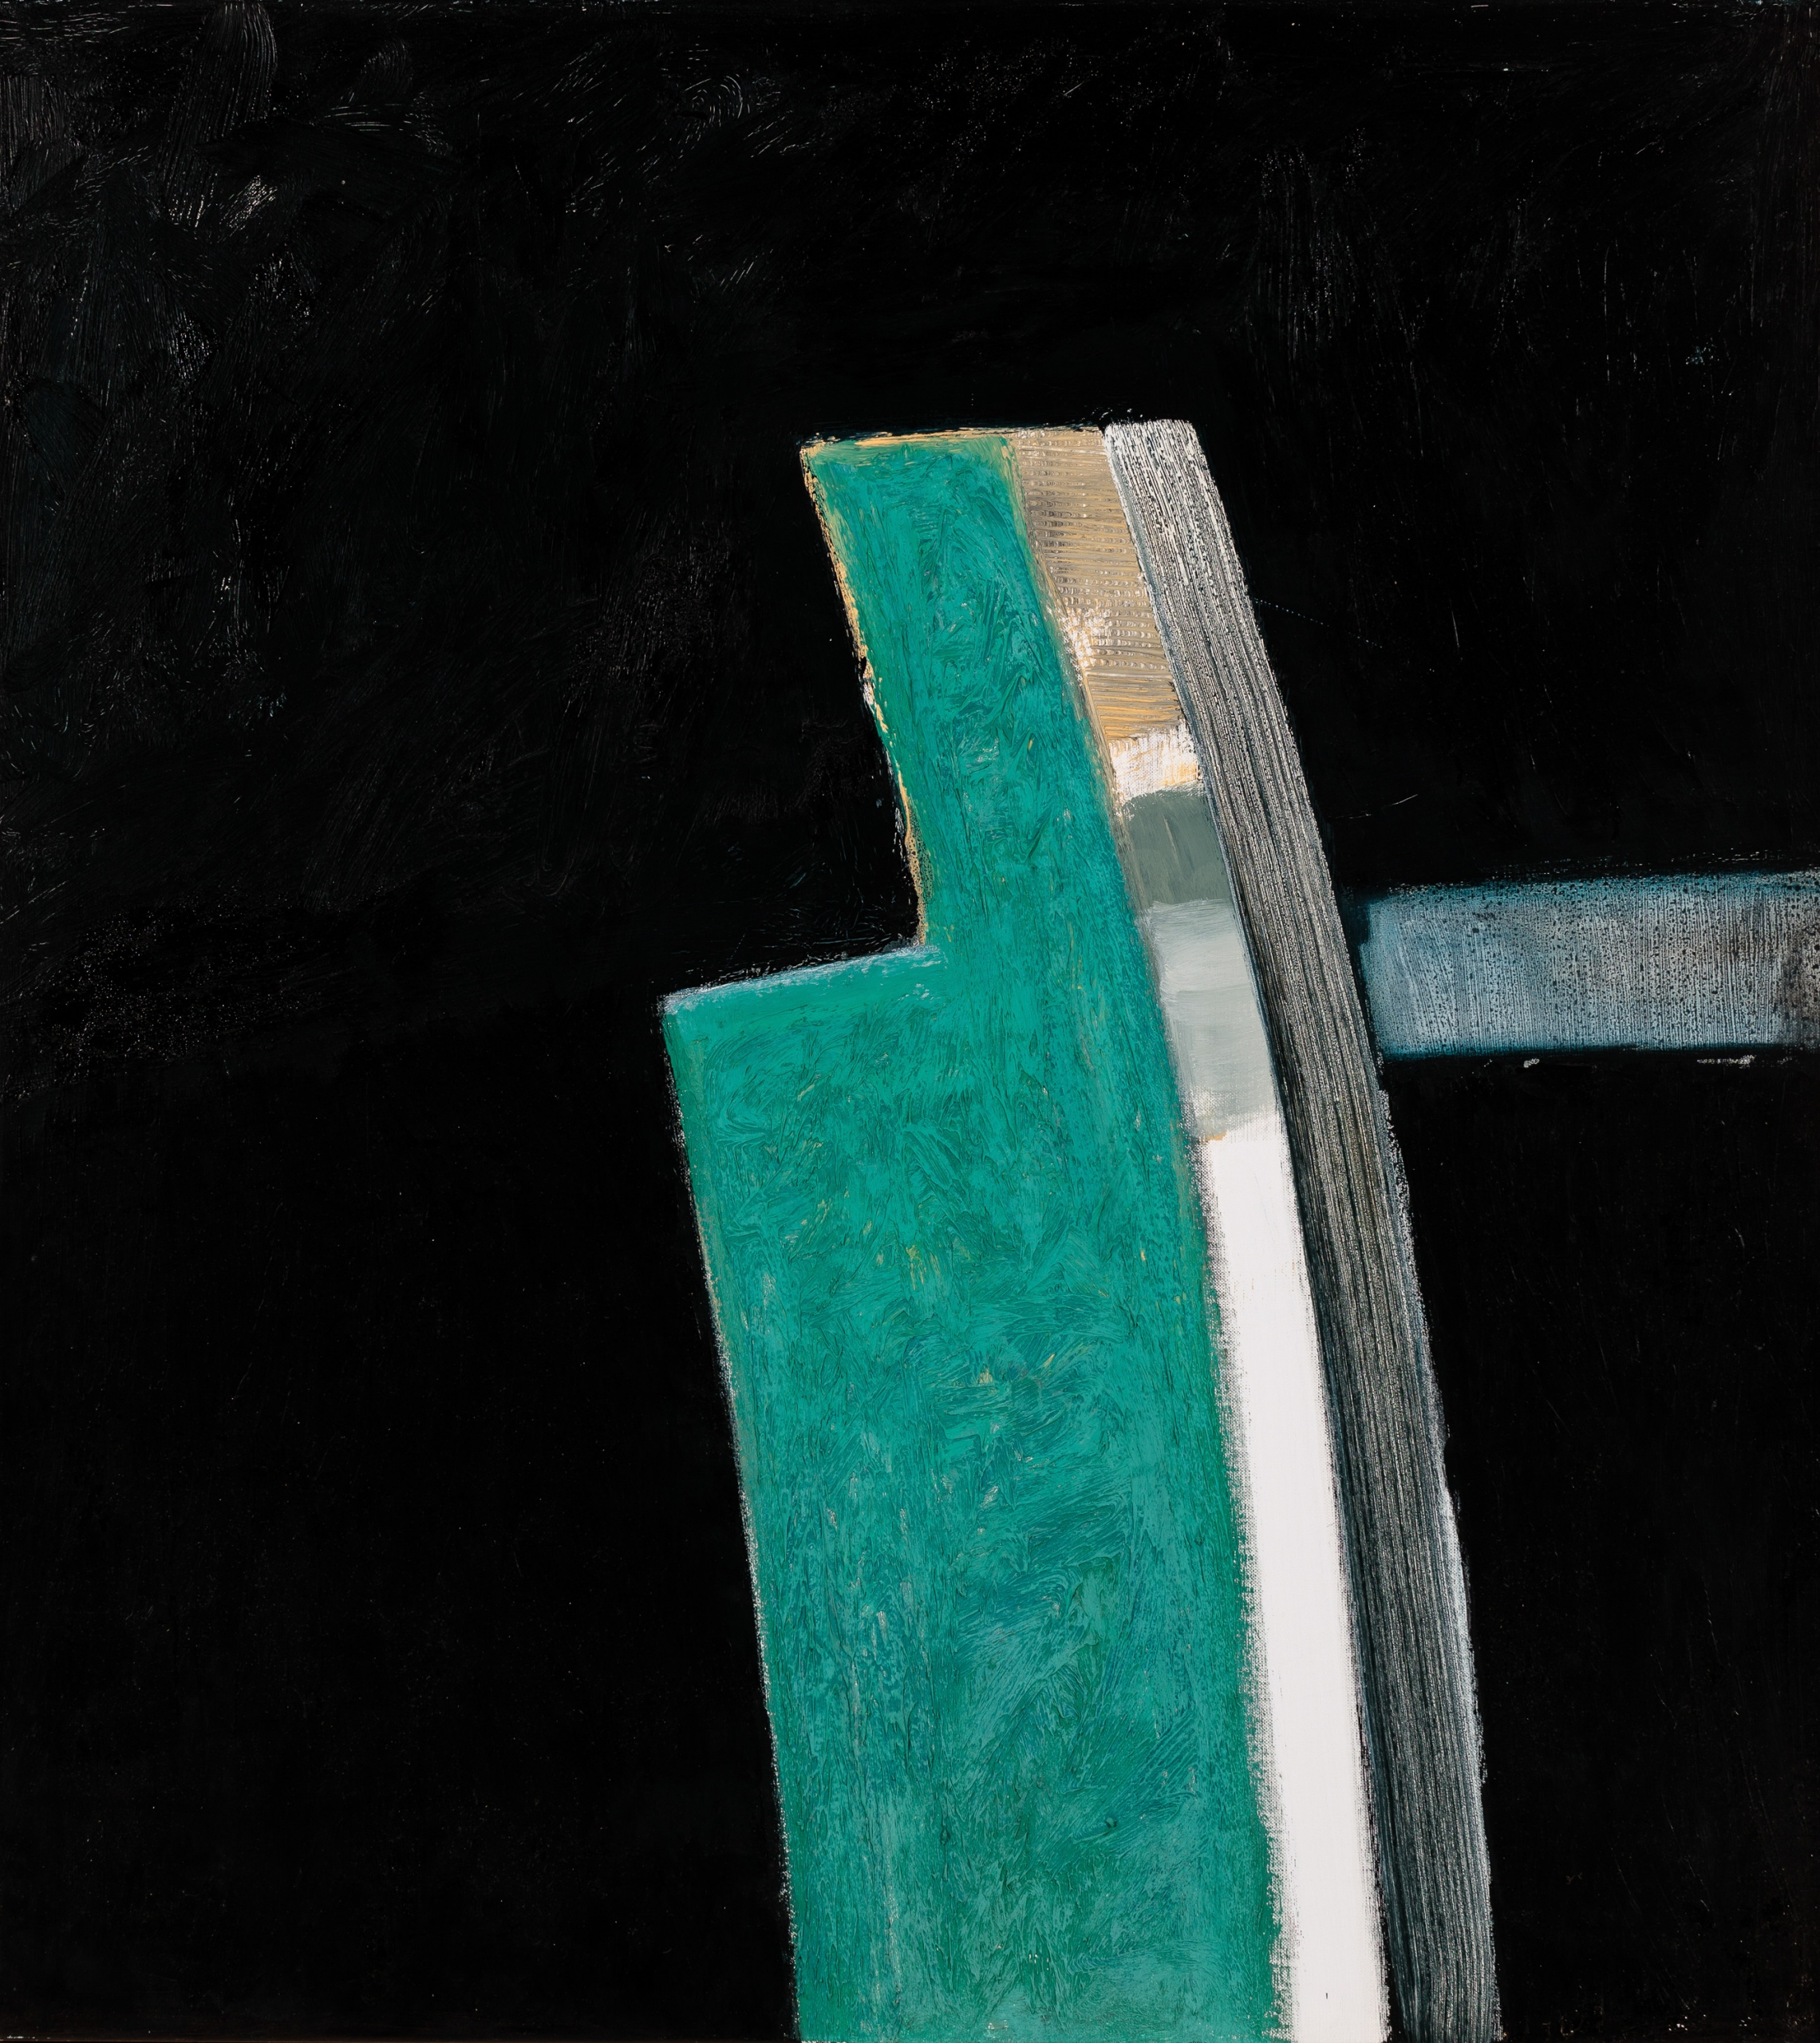 Alois Riedl, Ohne Titel / untitled